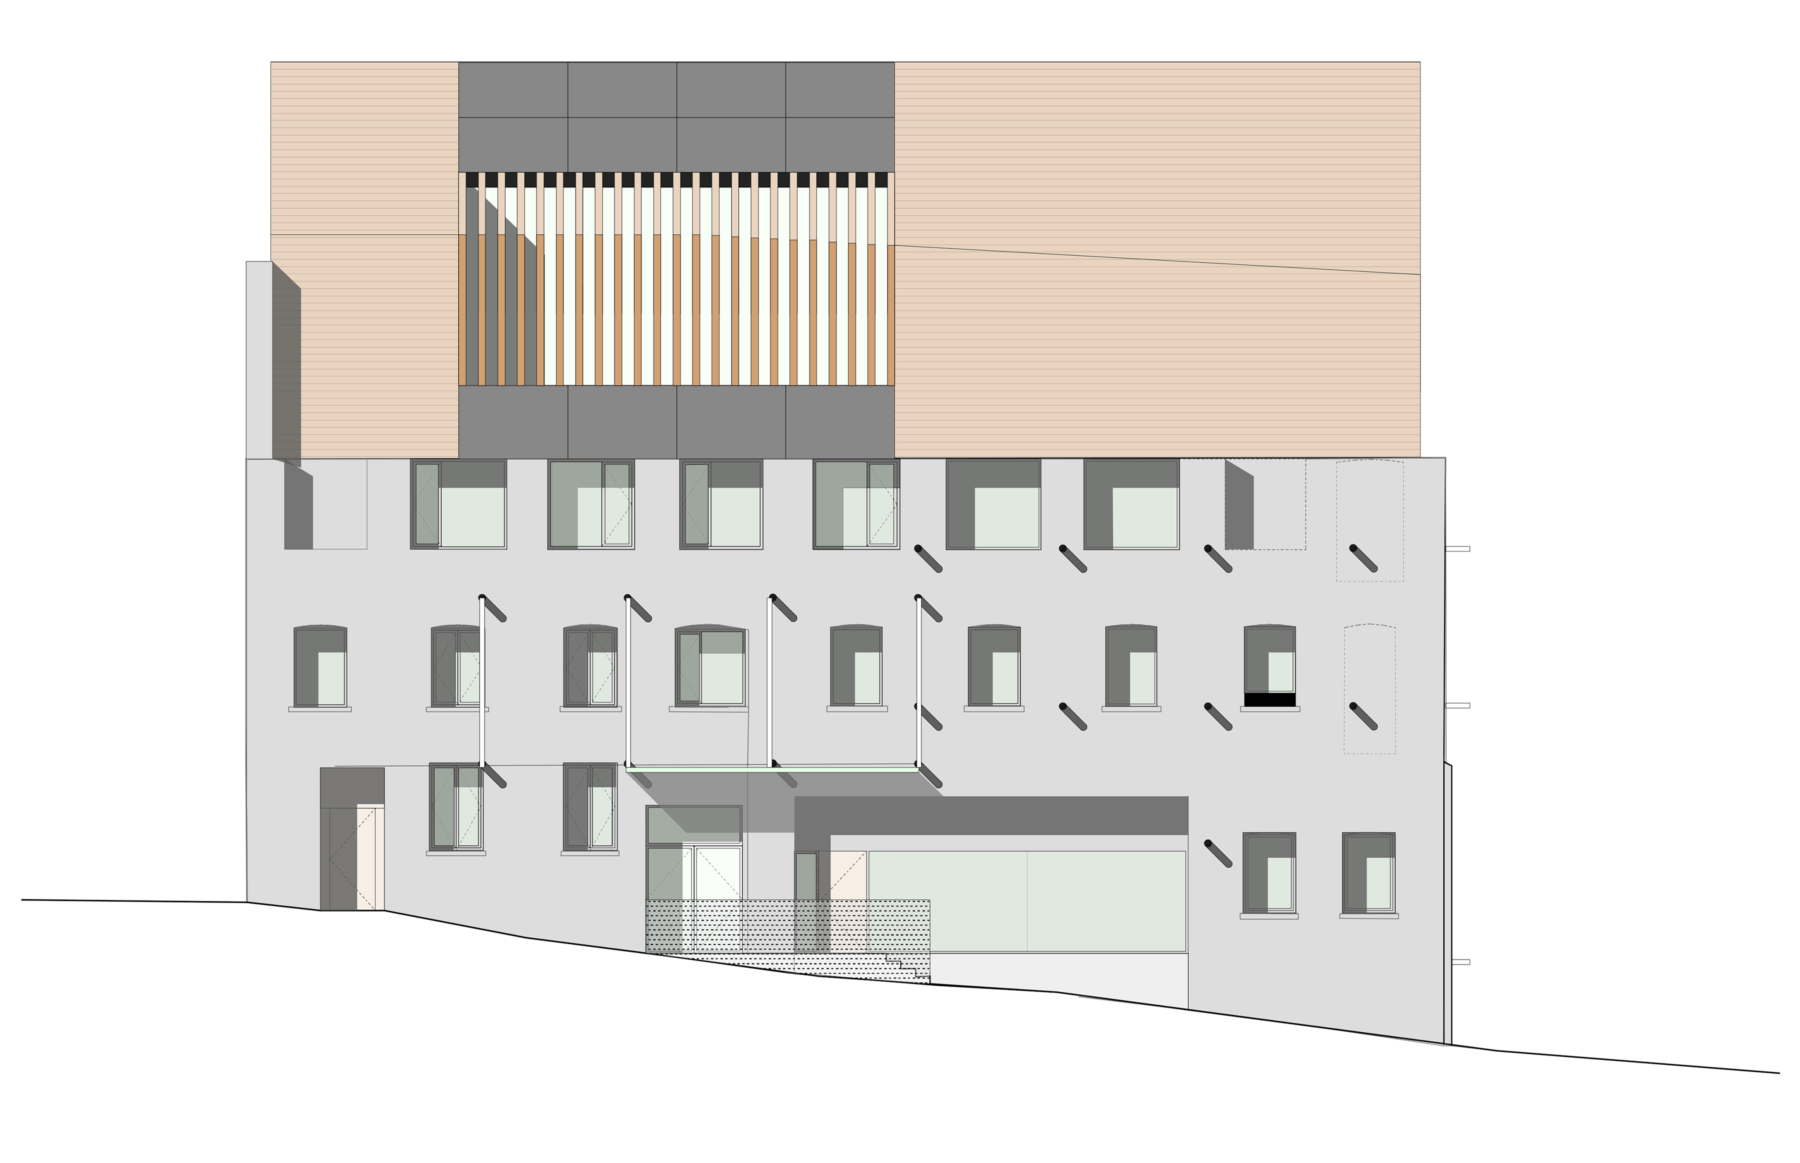 Sarah-Wigglesworth-Architects Swansea-Print-Works Drawing Elevation 3600